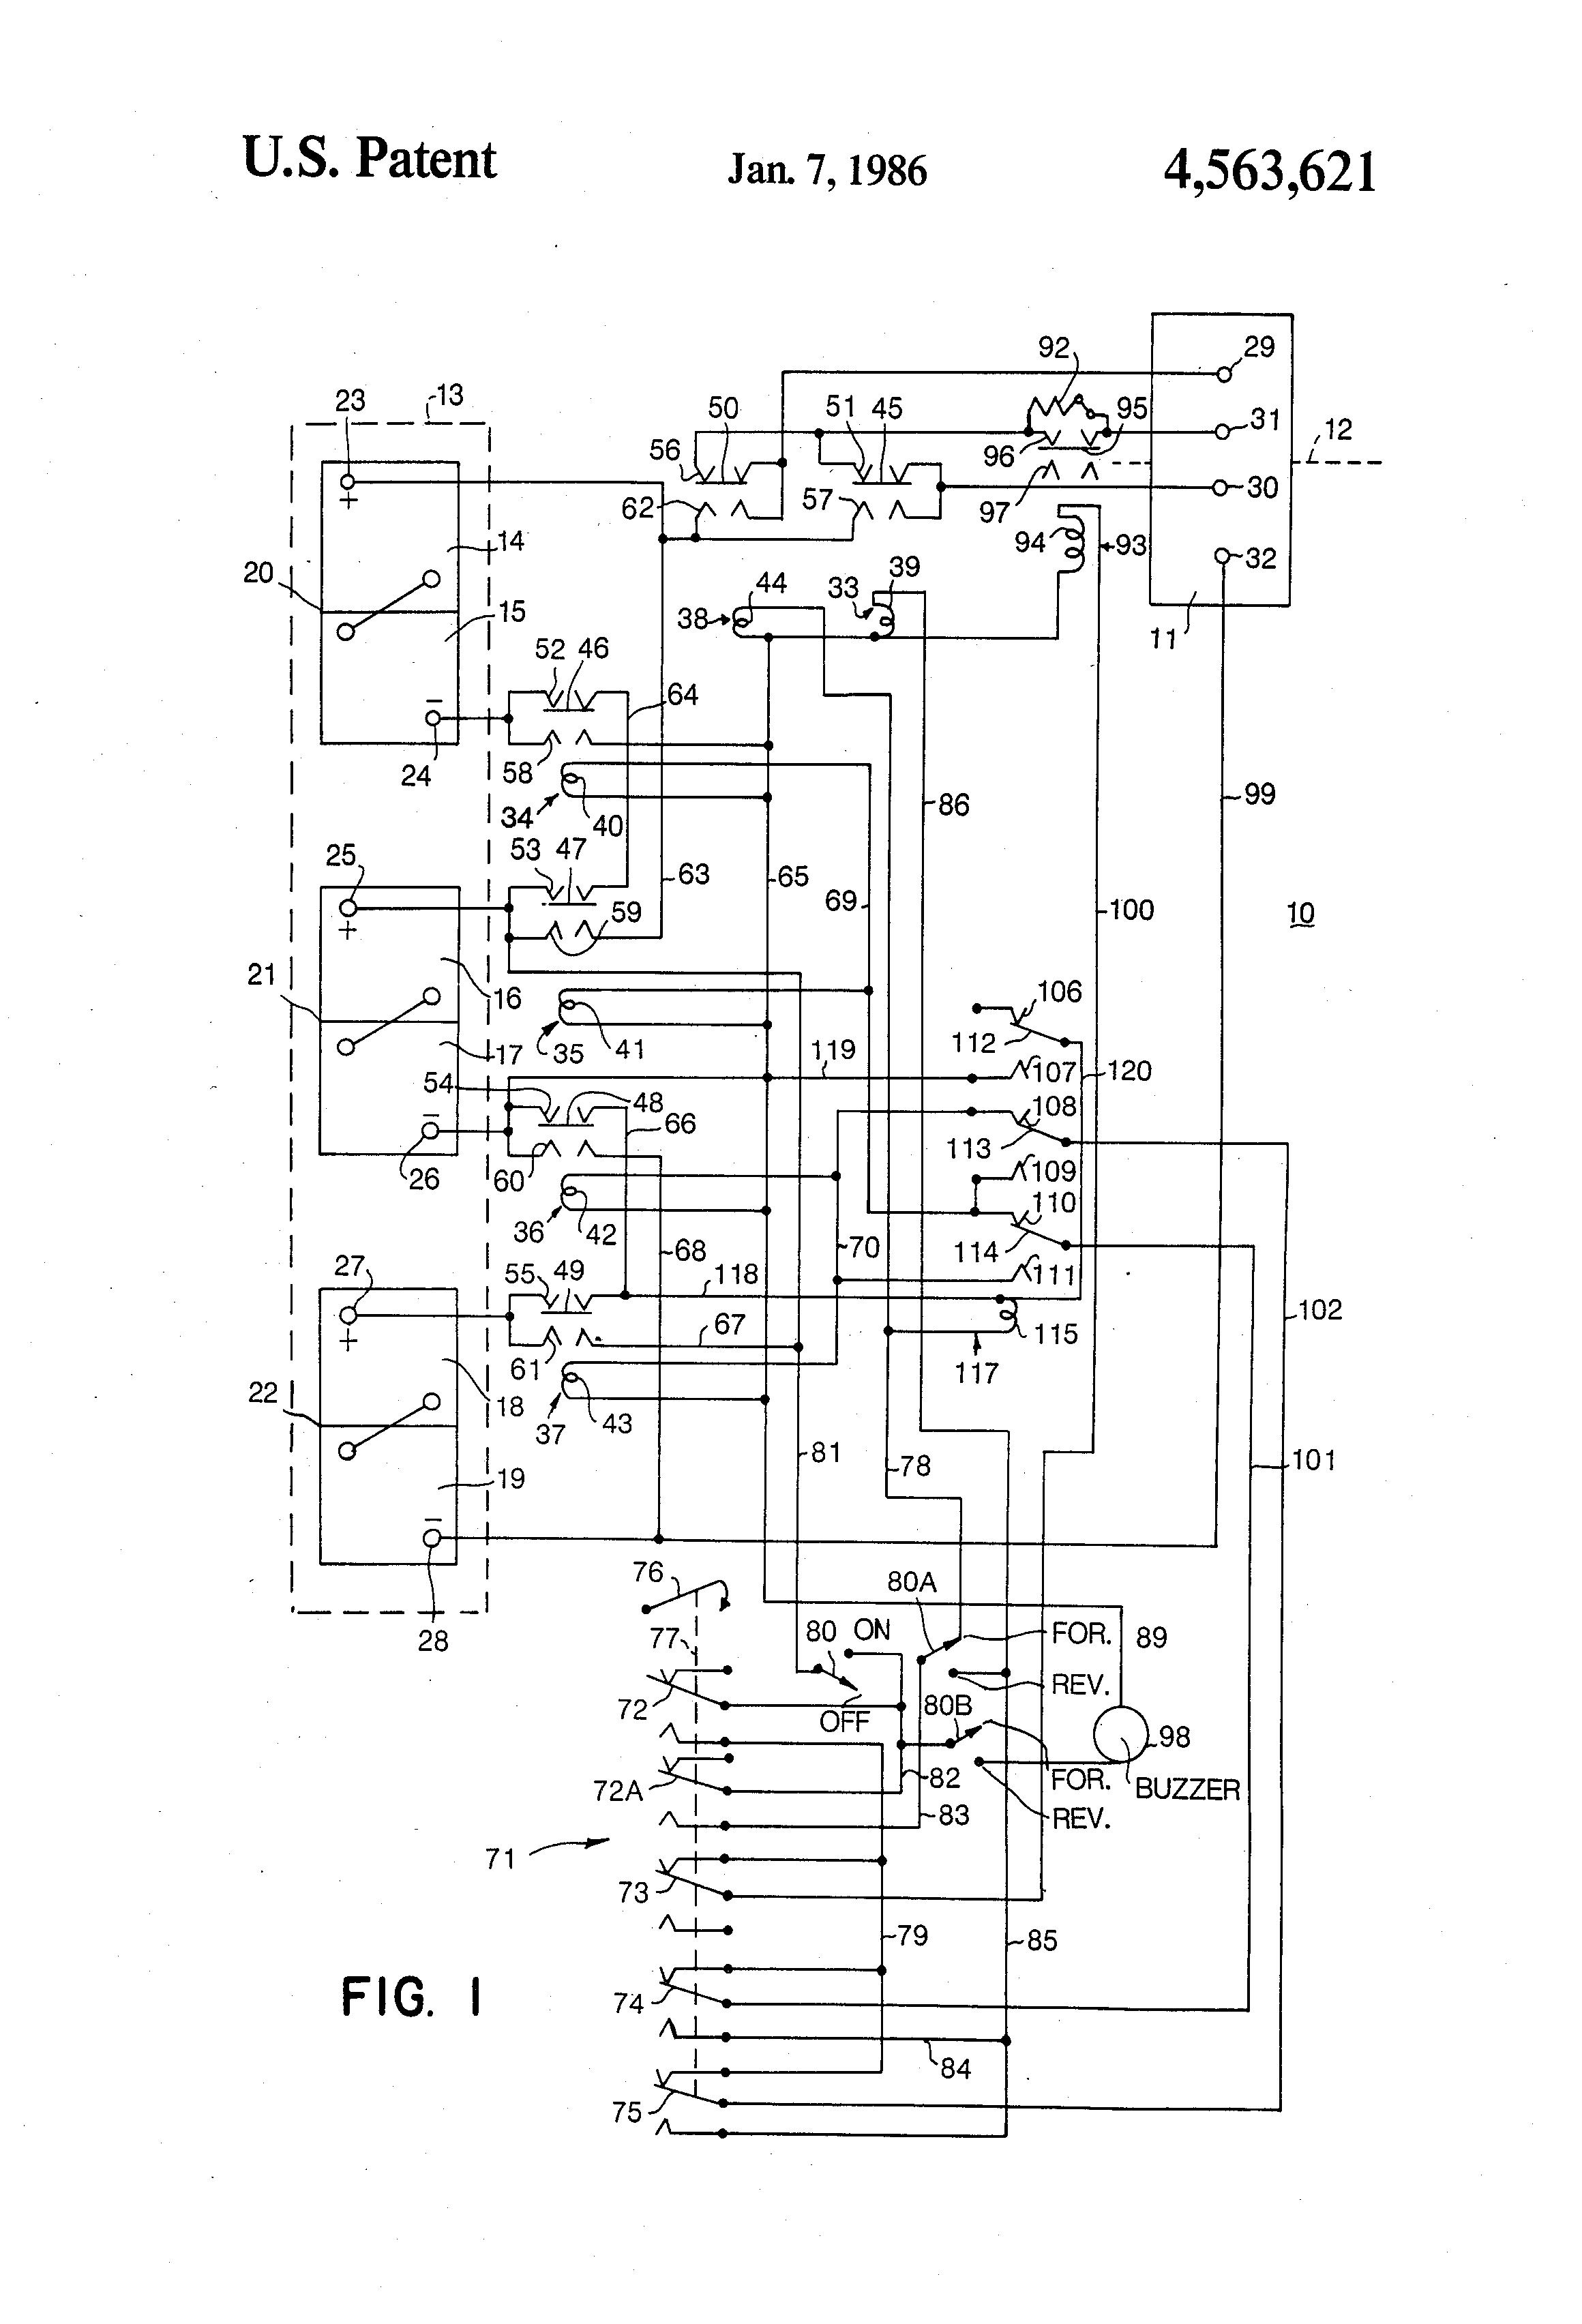 1988 ezgo wiring diagram 1988 ezgo wiring diagram e27 wiring diagram  1988 ezgo wiring diagram e27 wiring